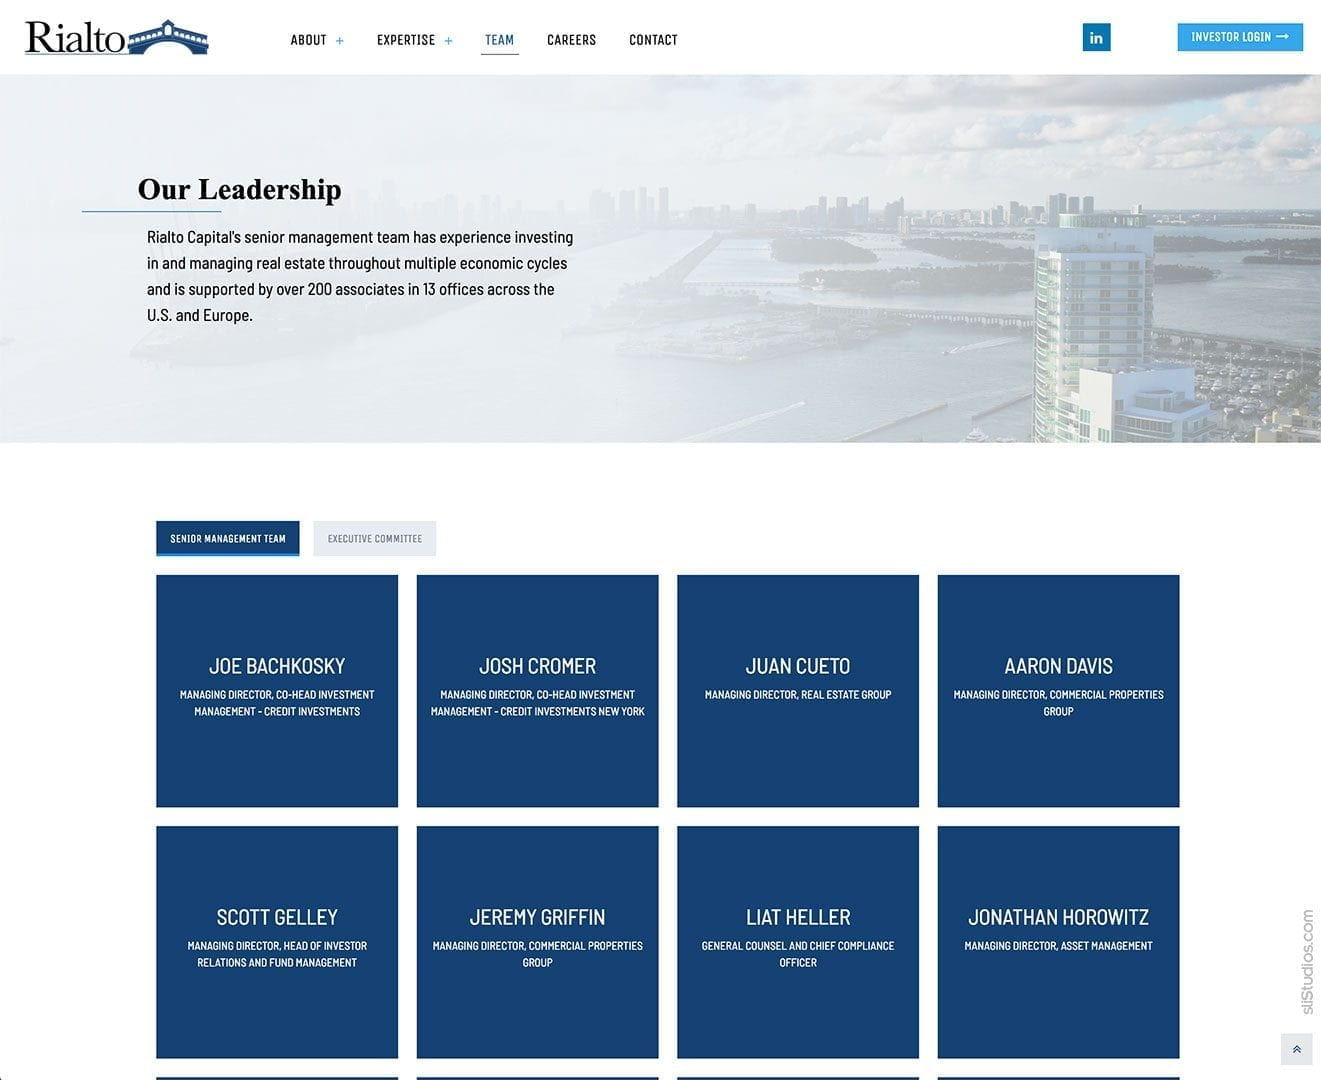 Team Members - Rialto Capital Website Design - sliStudios